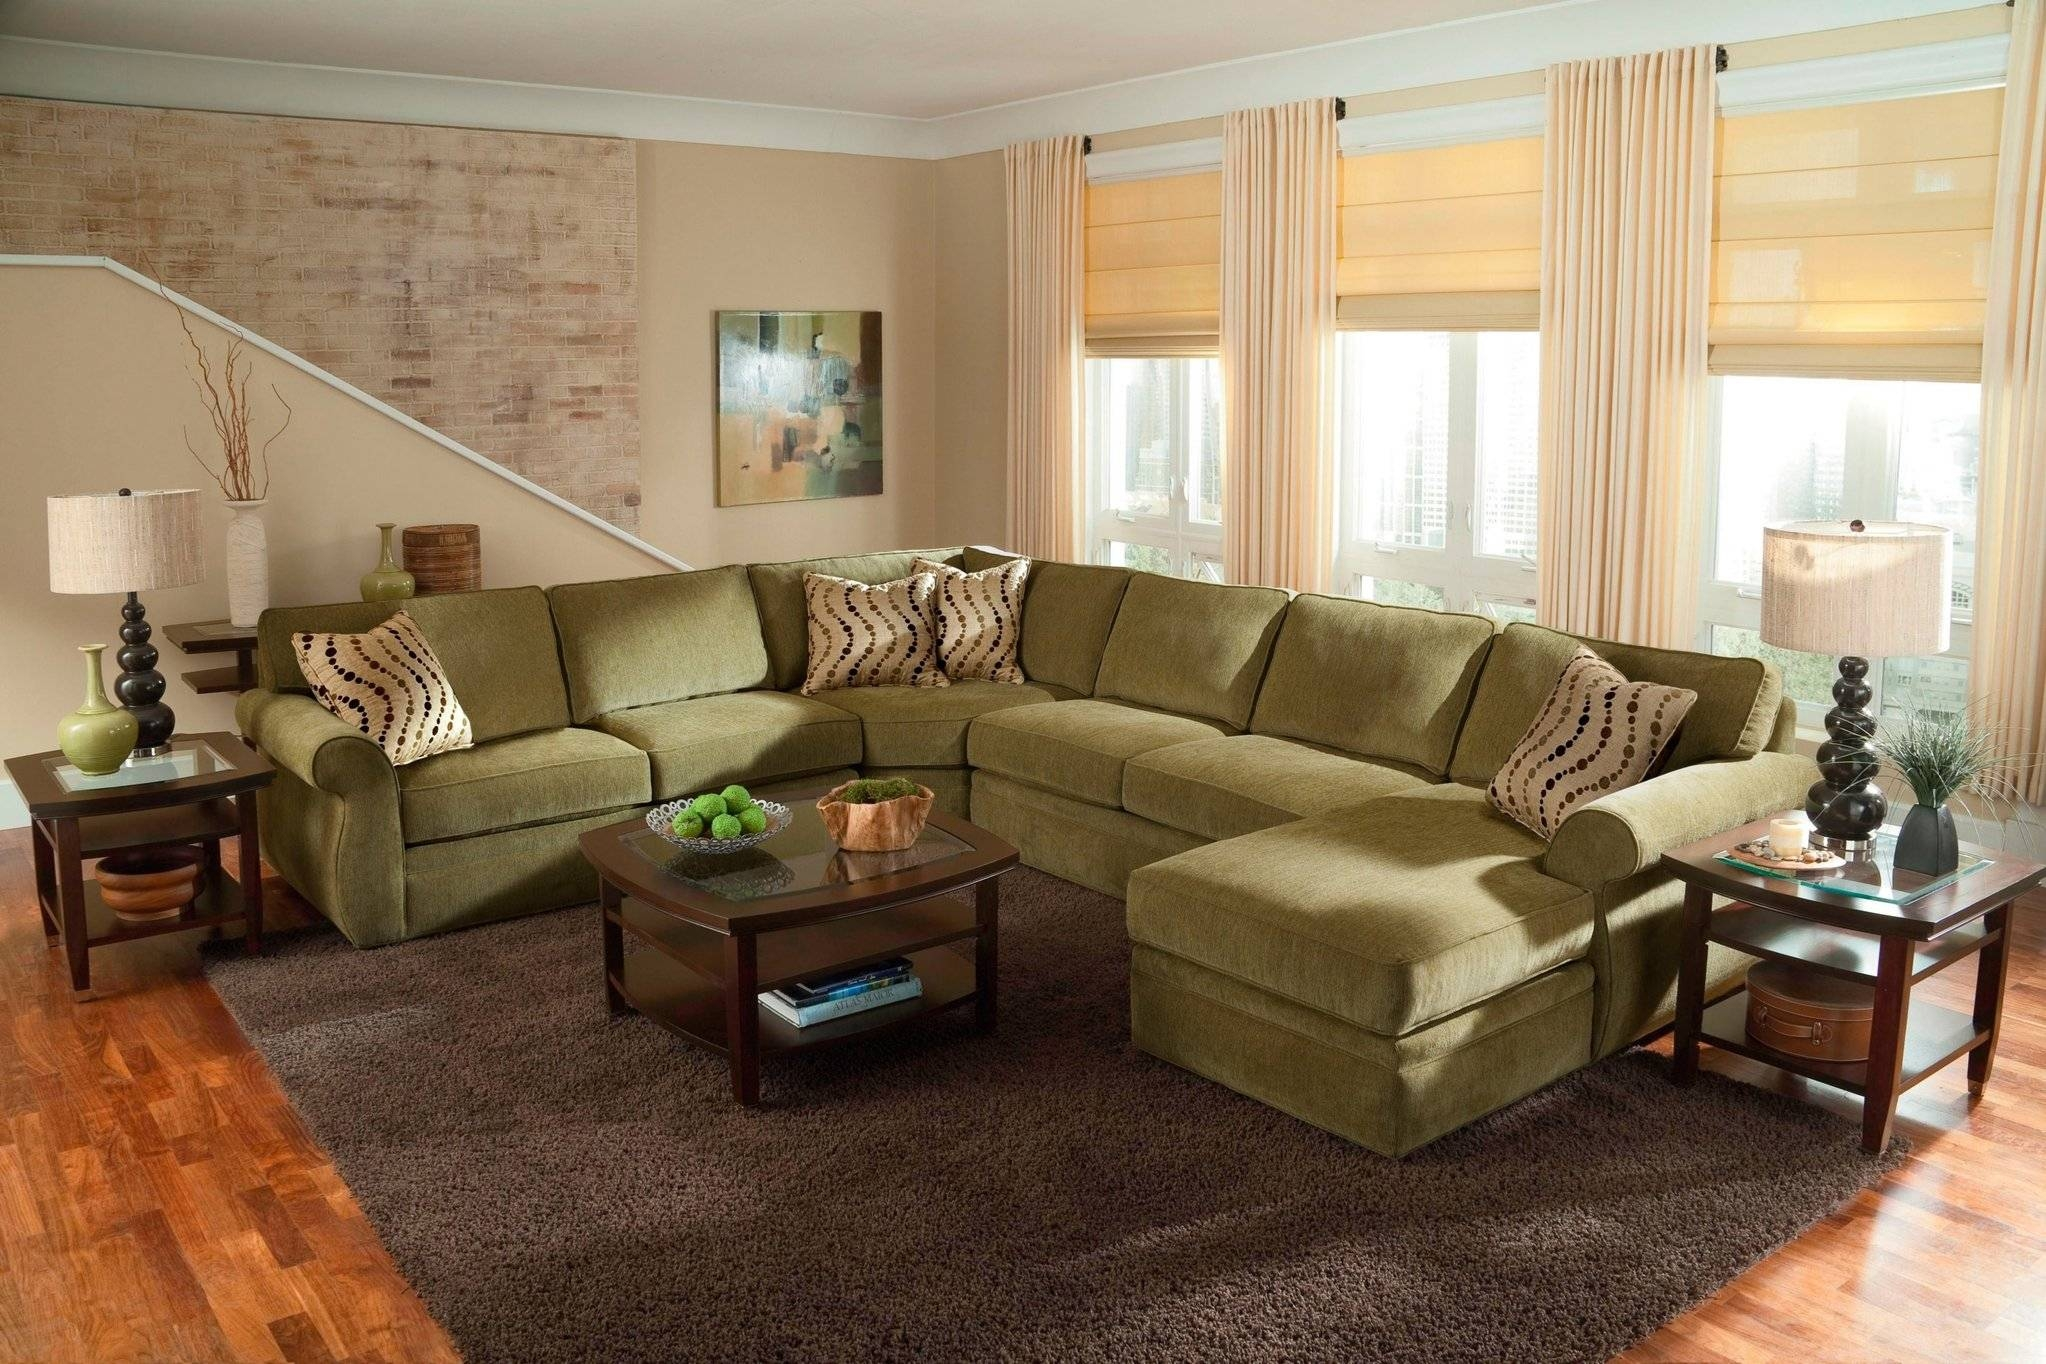 Traditional Sectional Sofas | Traditional Sectionals | Traditional with regard to Traditional Sectional Sofas (Image 20 of 25)